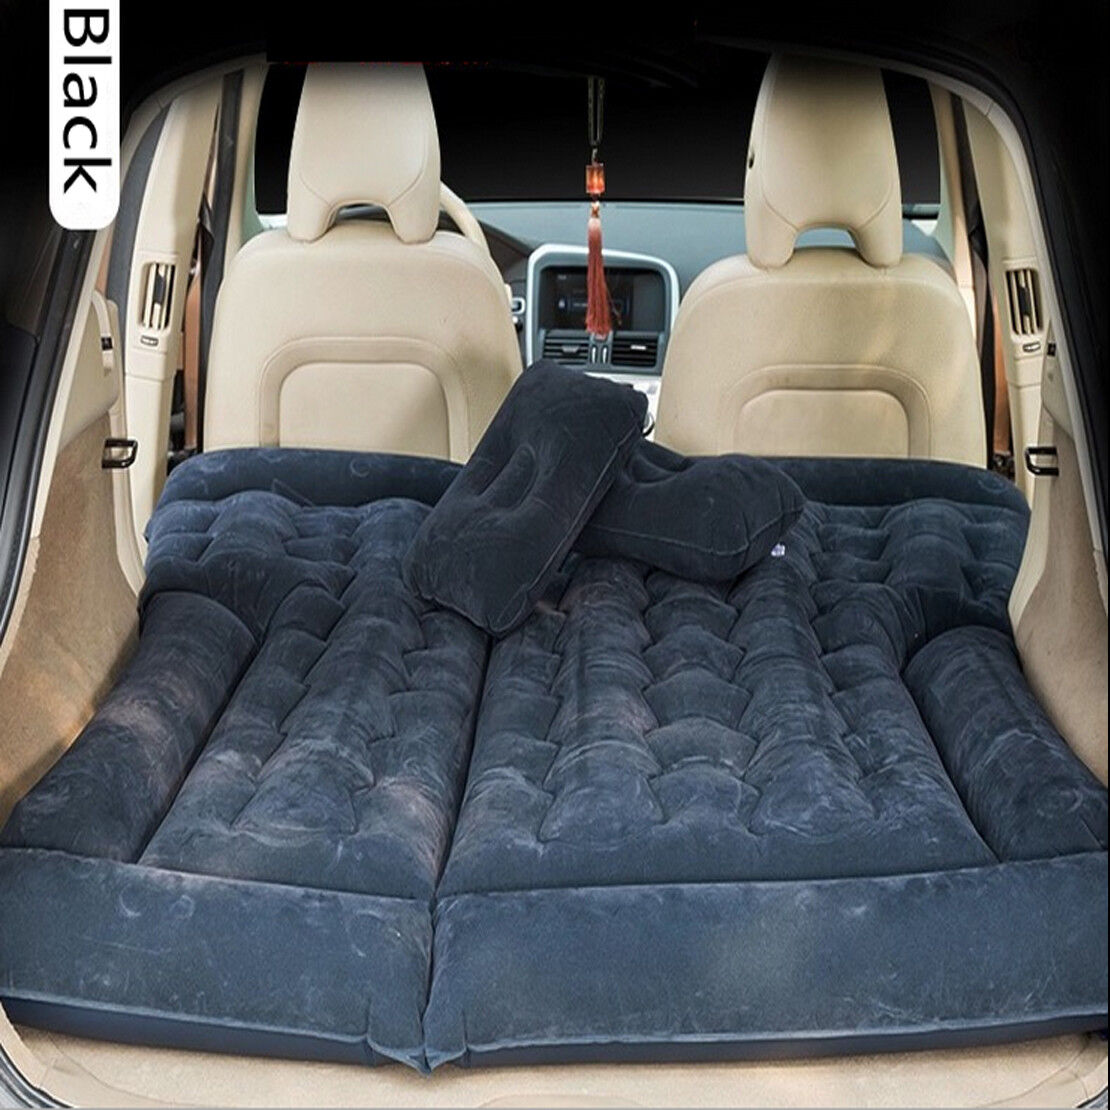 Black Suv Car Inflatable Mattress Travel Back Seat Air Bed Durable Camping Ebay